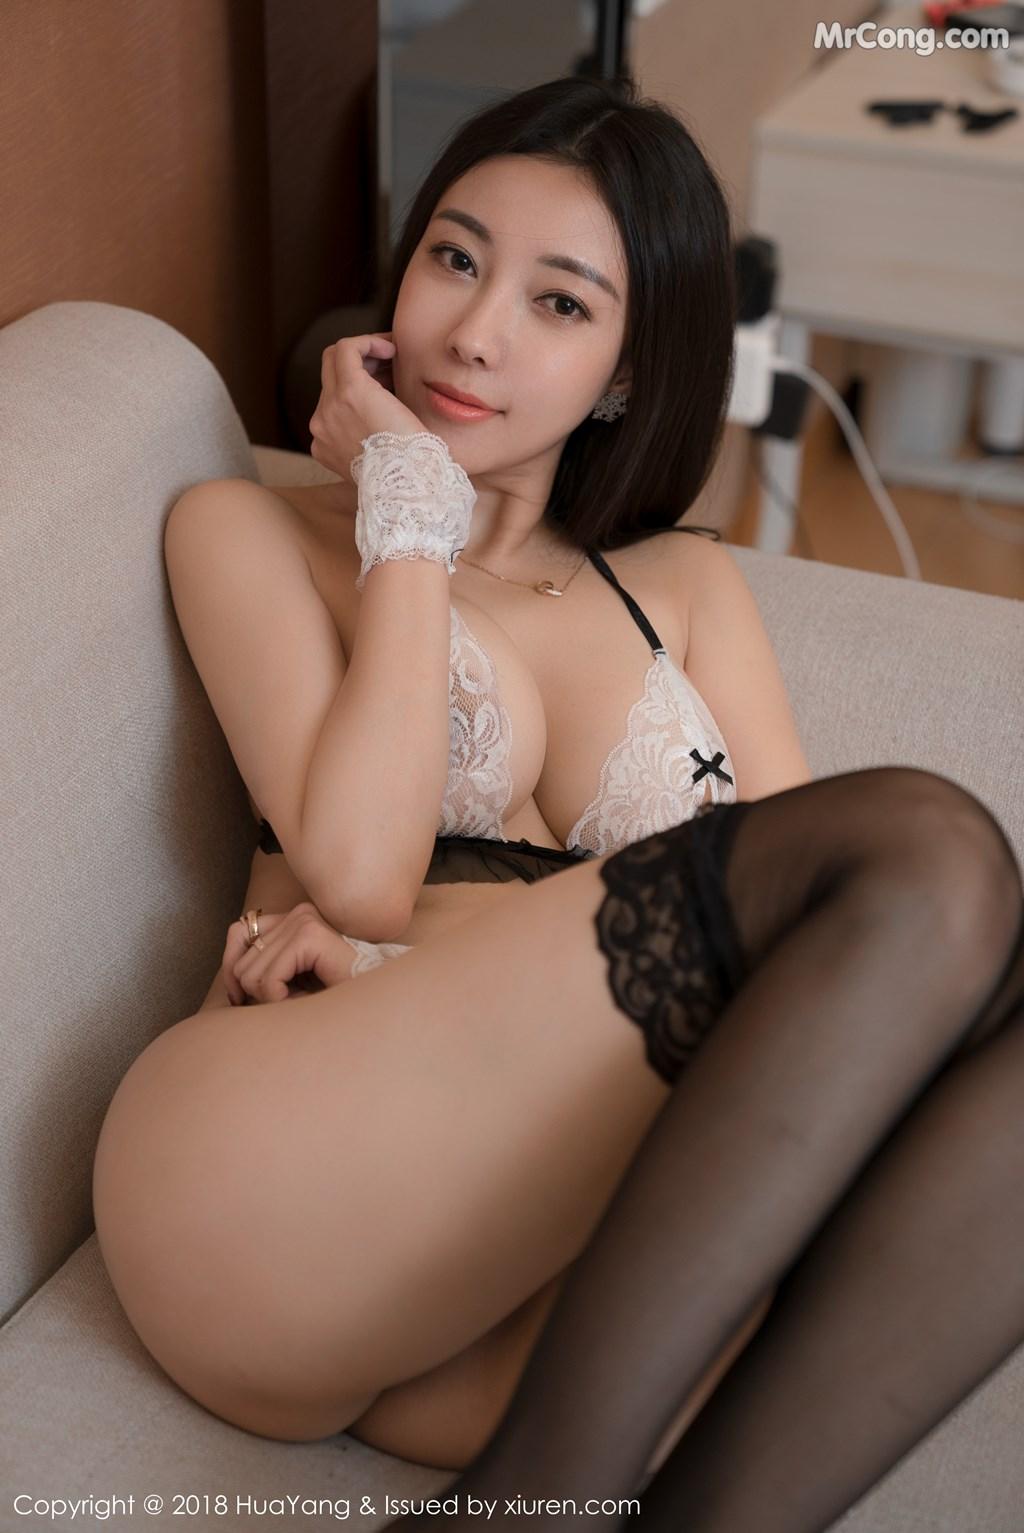 Image HuaYang-2018-01-26-Vol.028-Victoria-Guo-Er-MrCong.com-033 in post HuaYang 2018-01-26 Vol.028: Người mẫu Victoria (果儿) (41 ảnh)